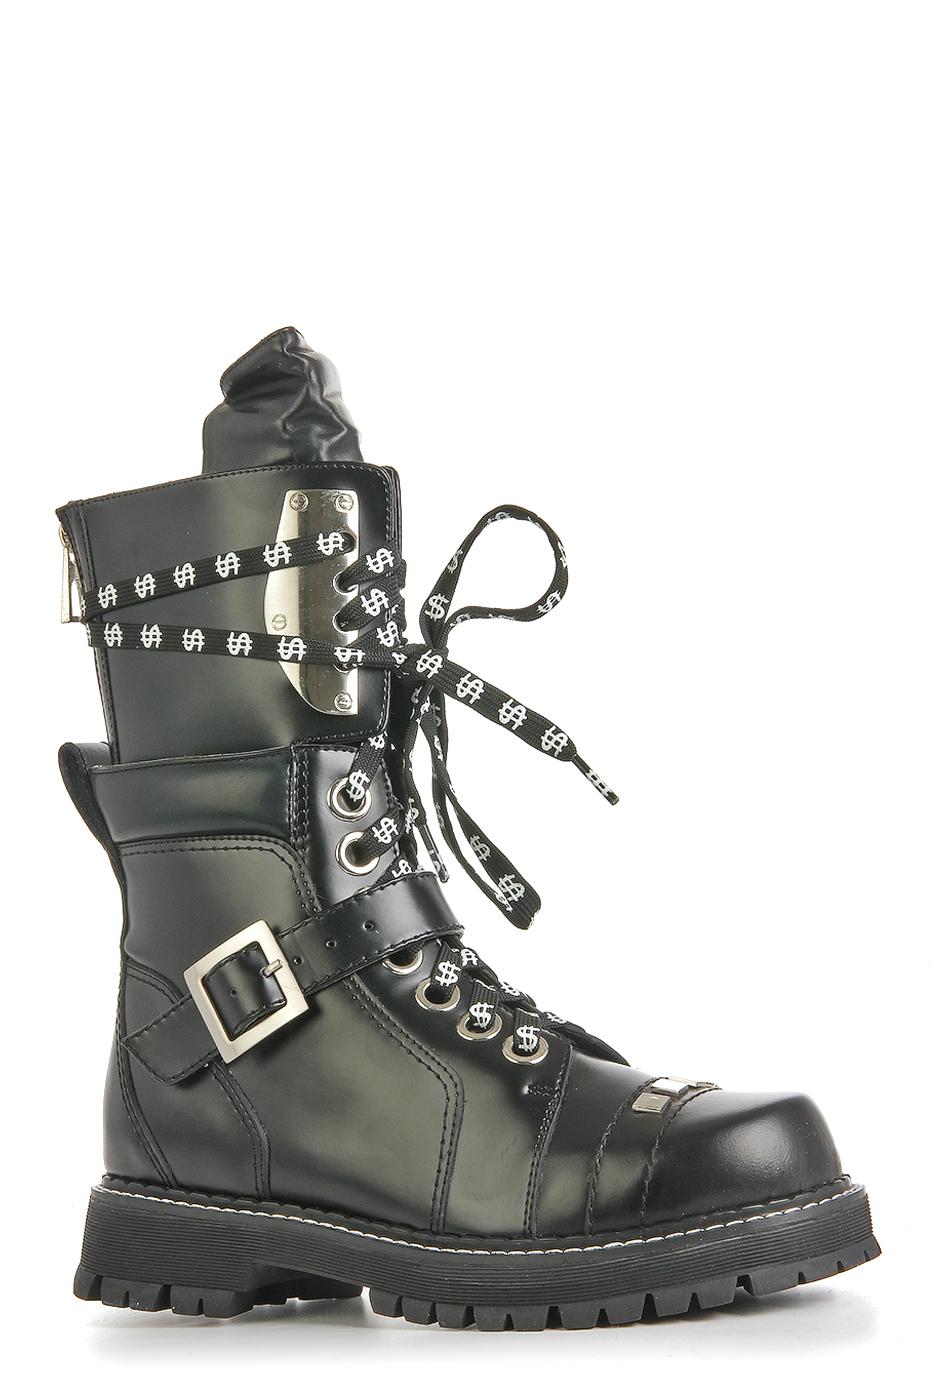 НАТУРАЛЬНАЯ КОЖА    Ботинки PREDATOR (K01-A6/BLACK)K01-A6/BLACK